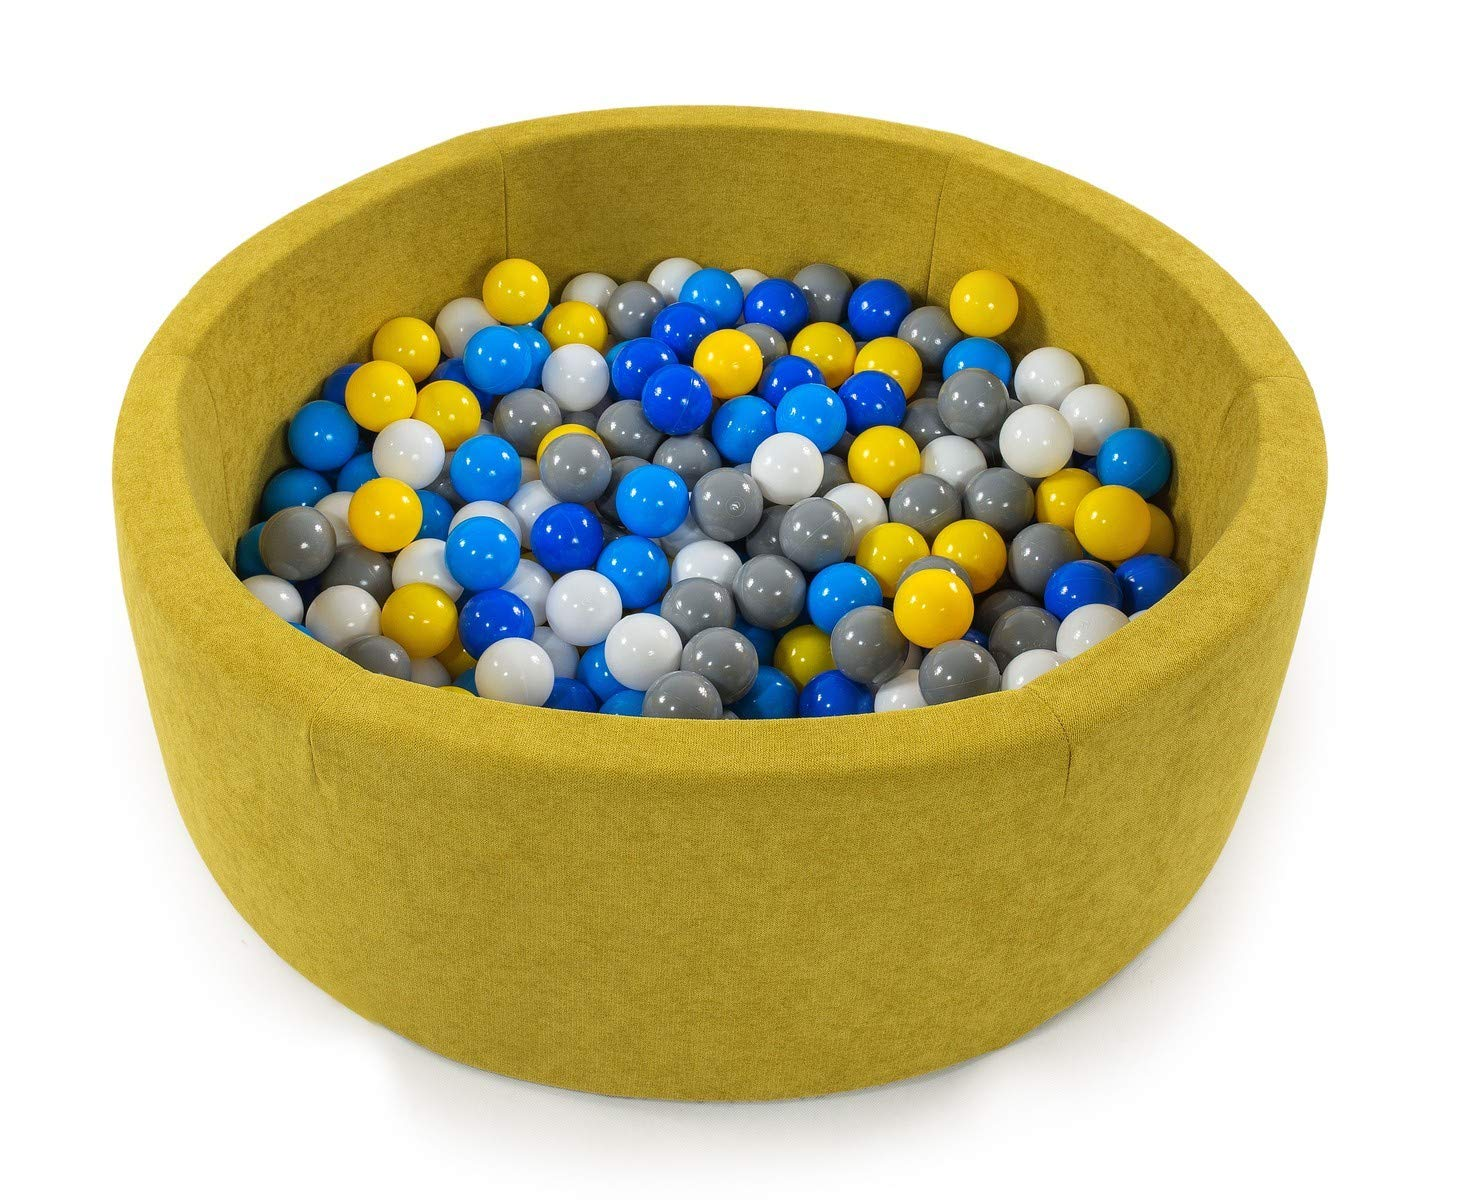 Tweepsy Kinder Baby B/ällebad Kugelbad Spielen B/ällchenpool Babyspielzeug 250 B/älle 90x30cm Handgefertigt EU BKOD4